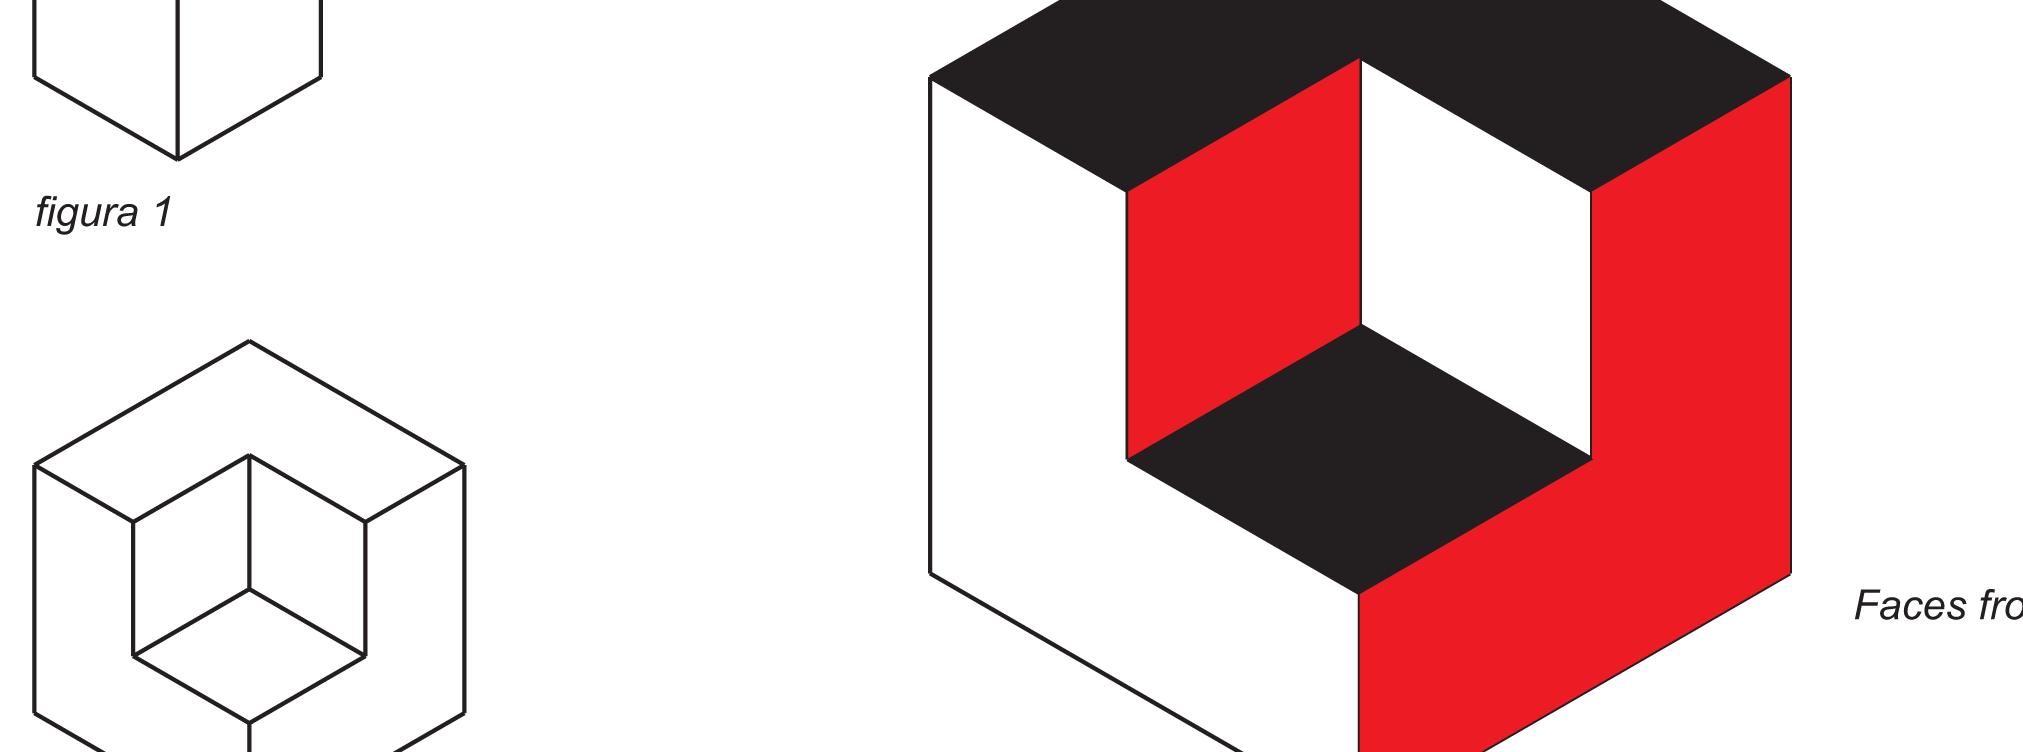 normas_trabalho_isometrica